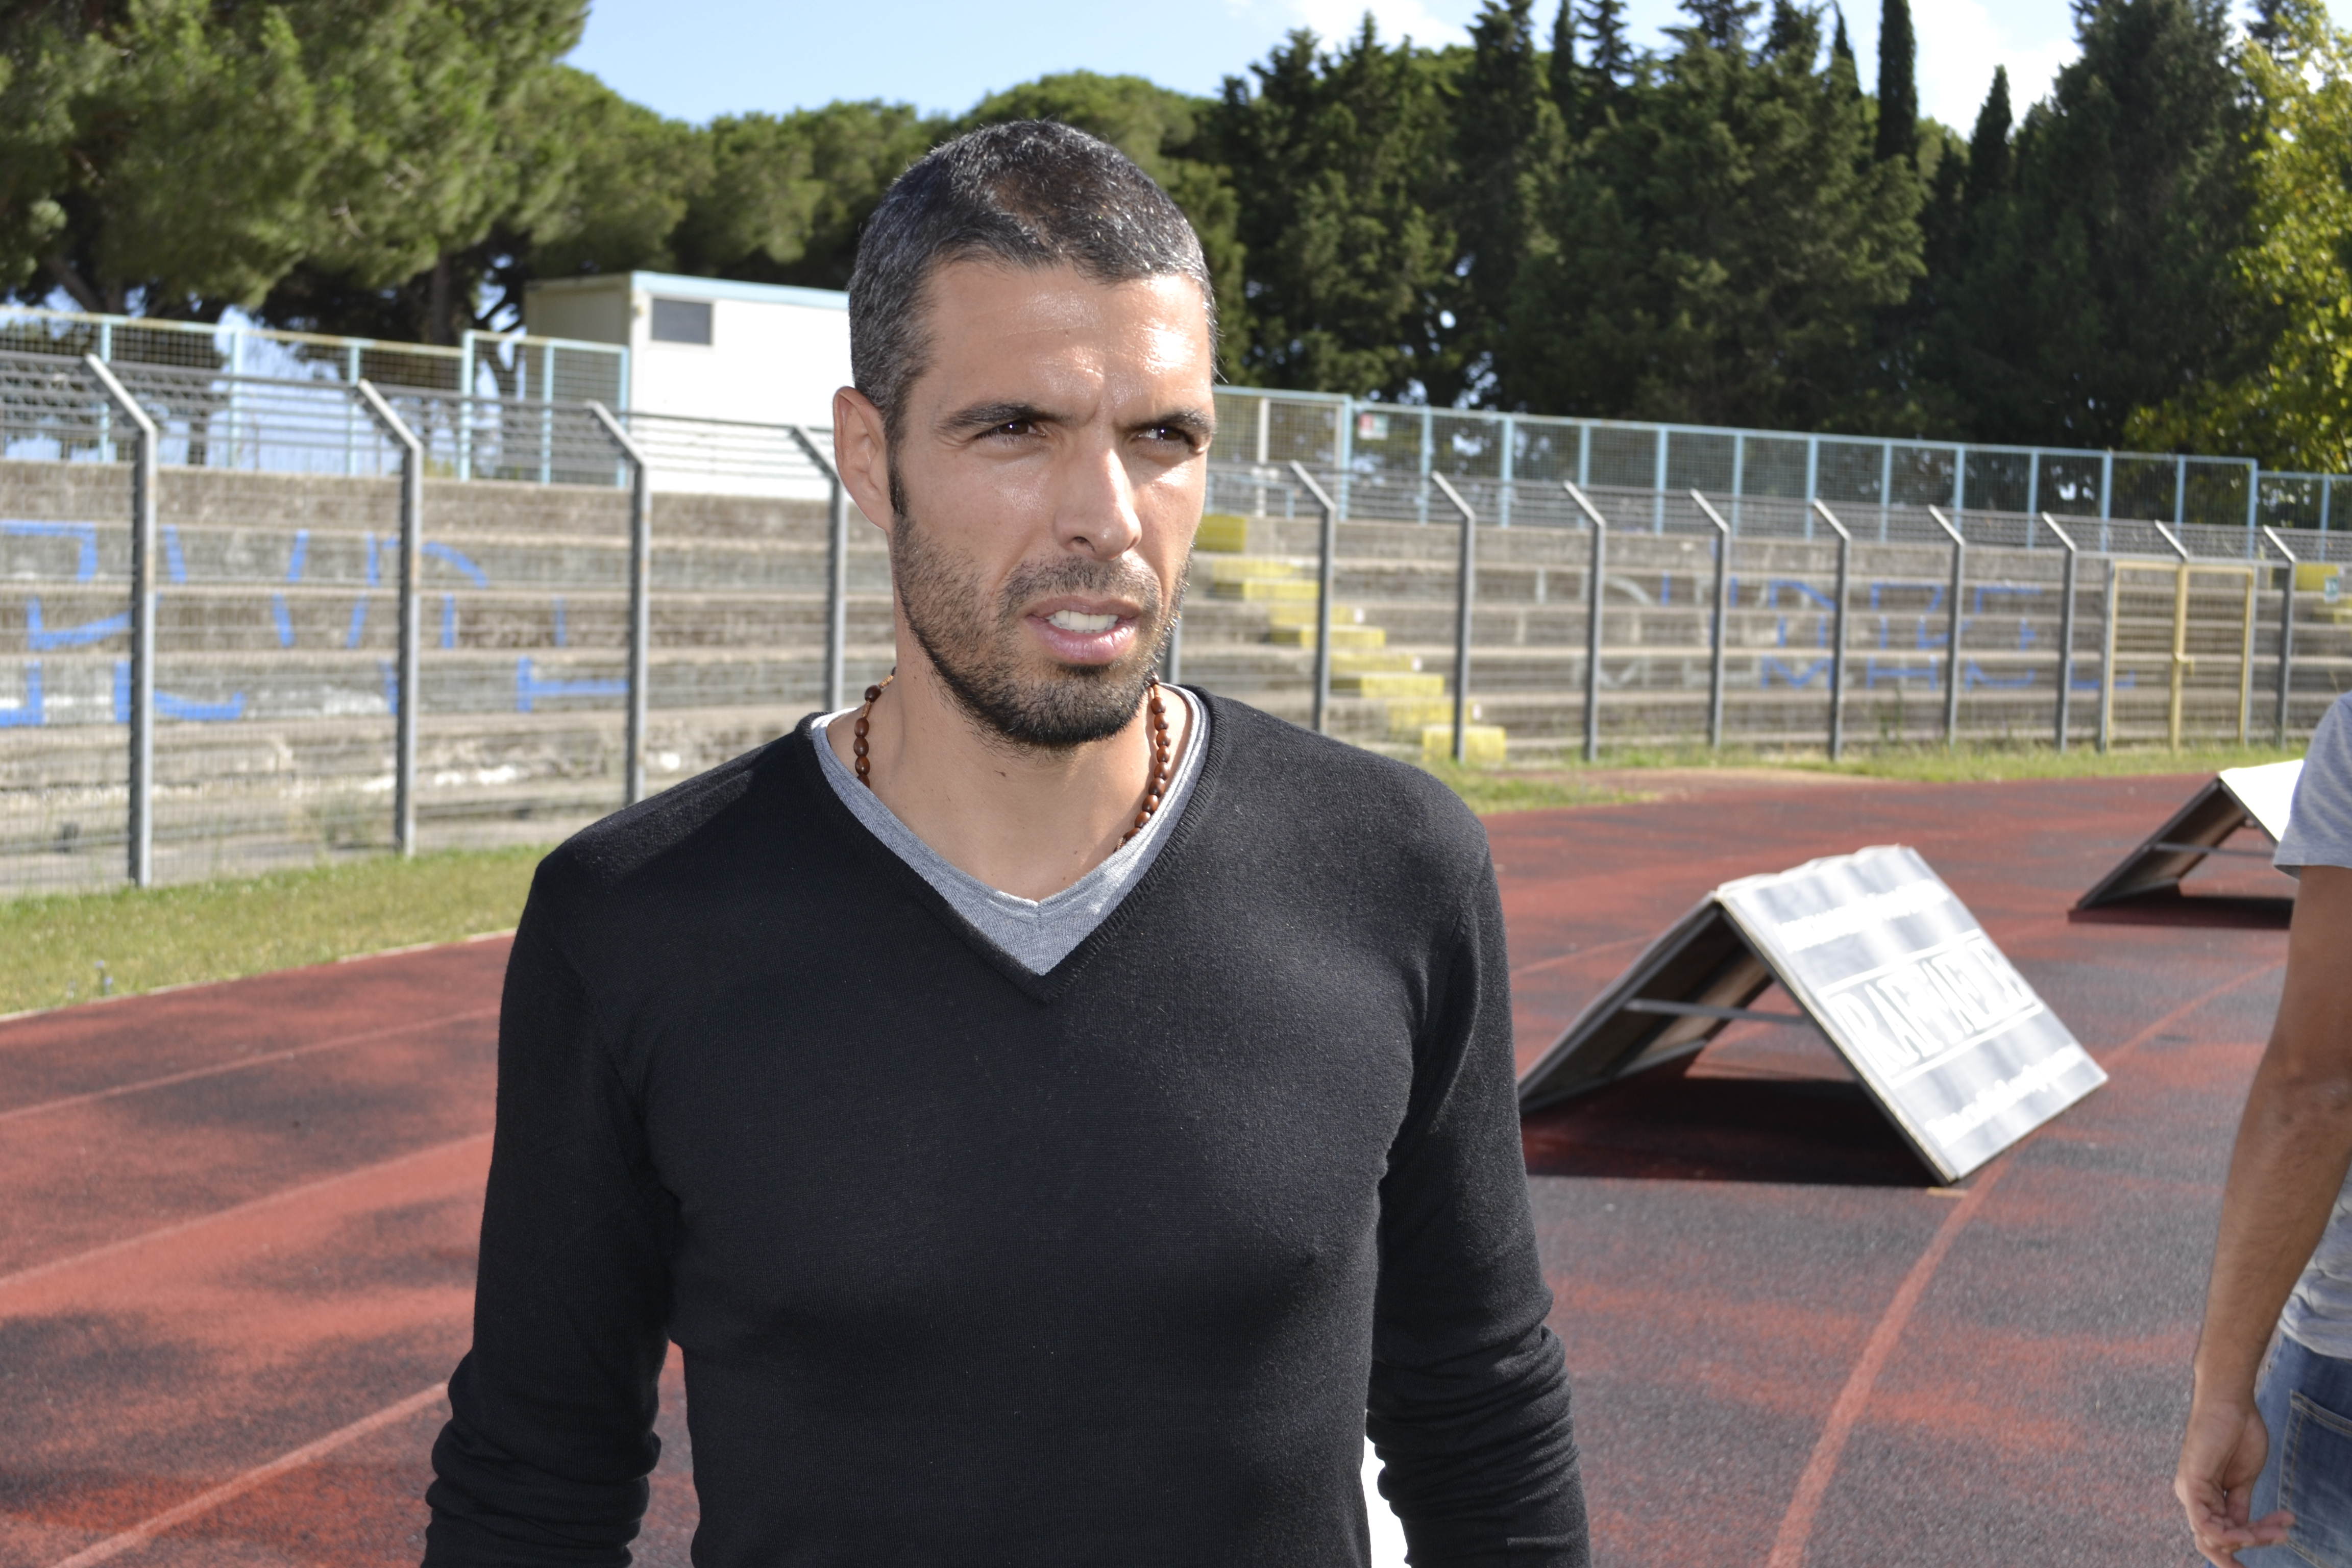 Fabio Celestini allenatore Terracina calcio. Anxur Time